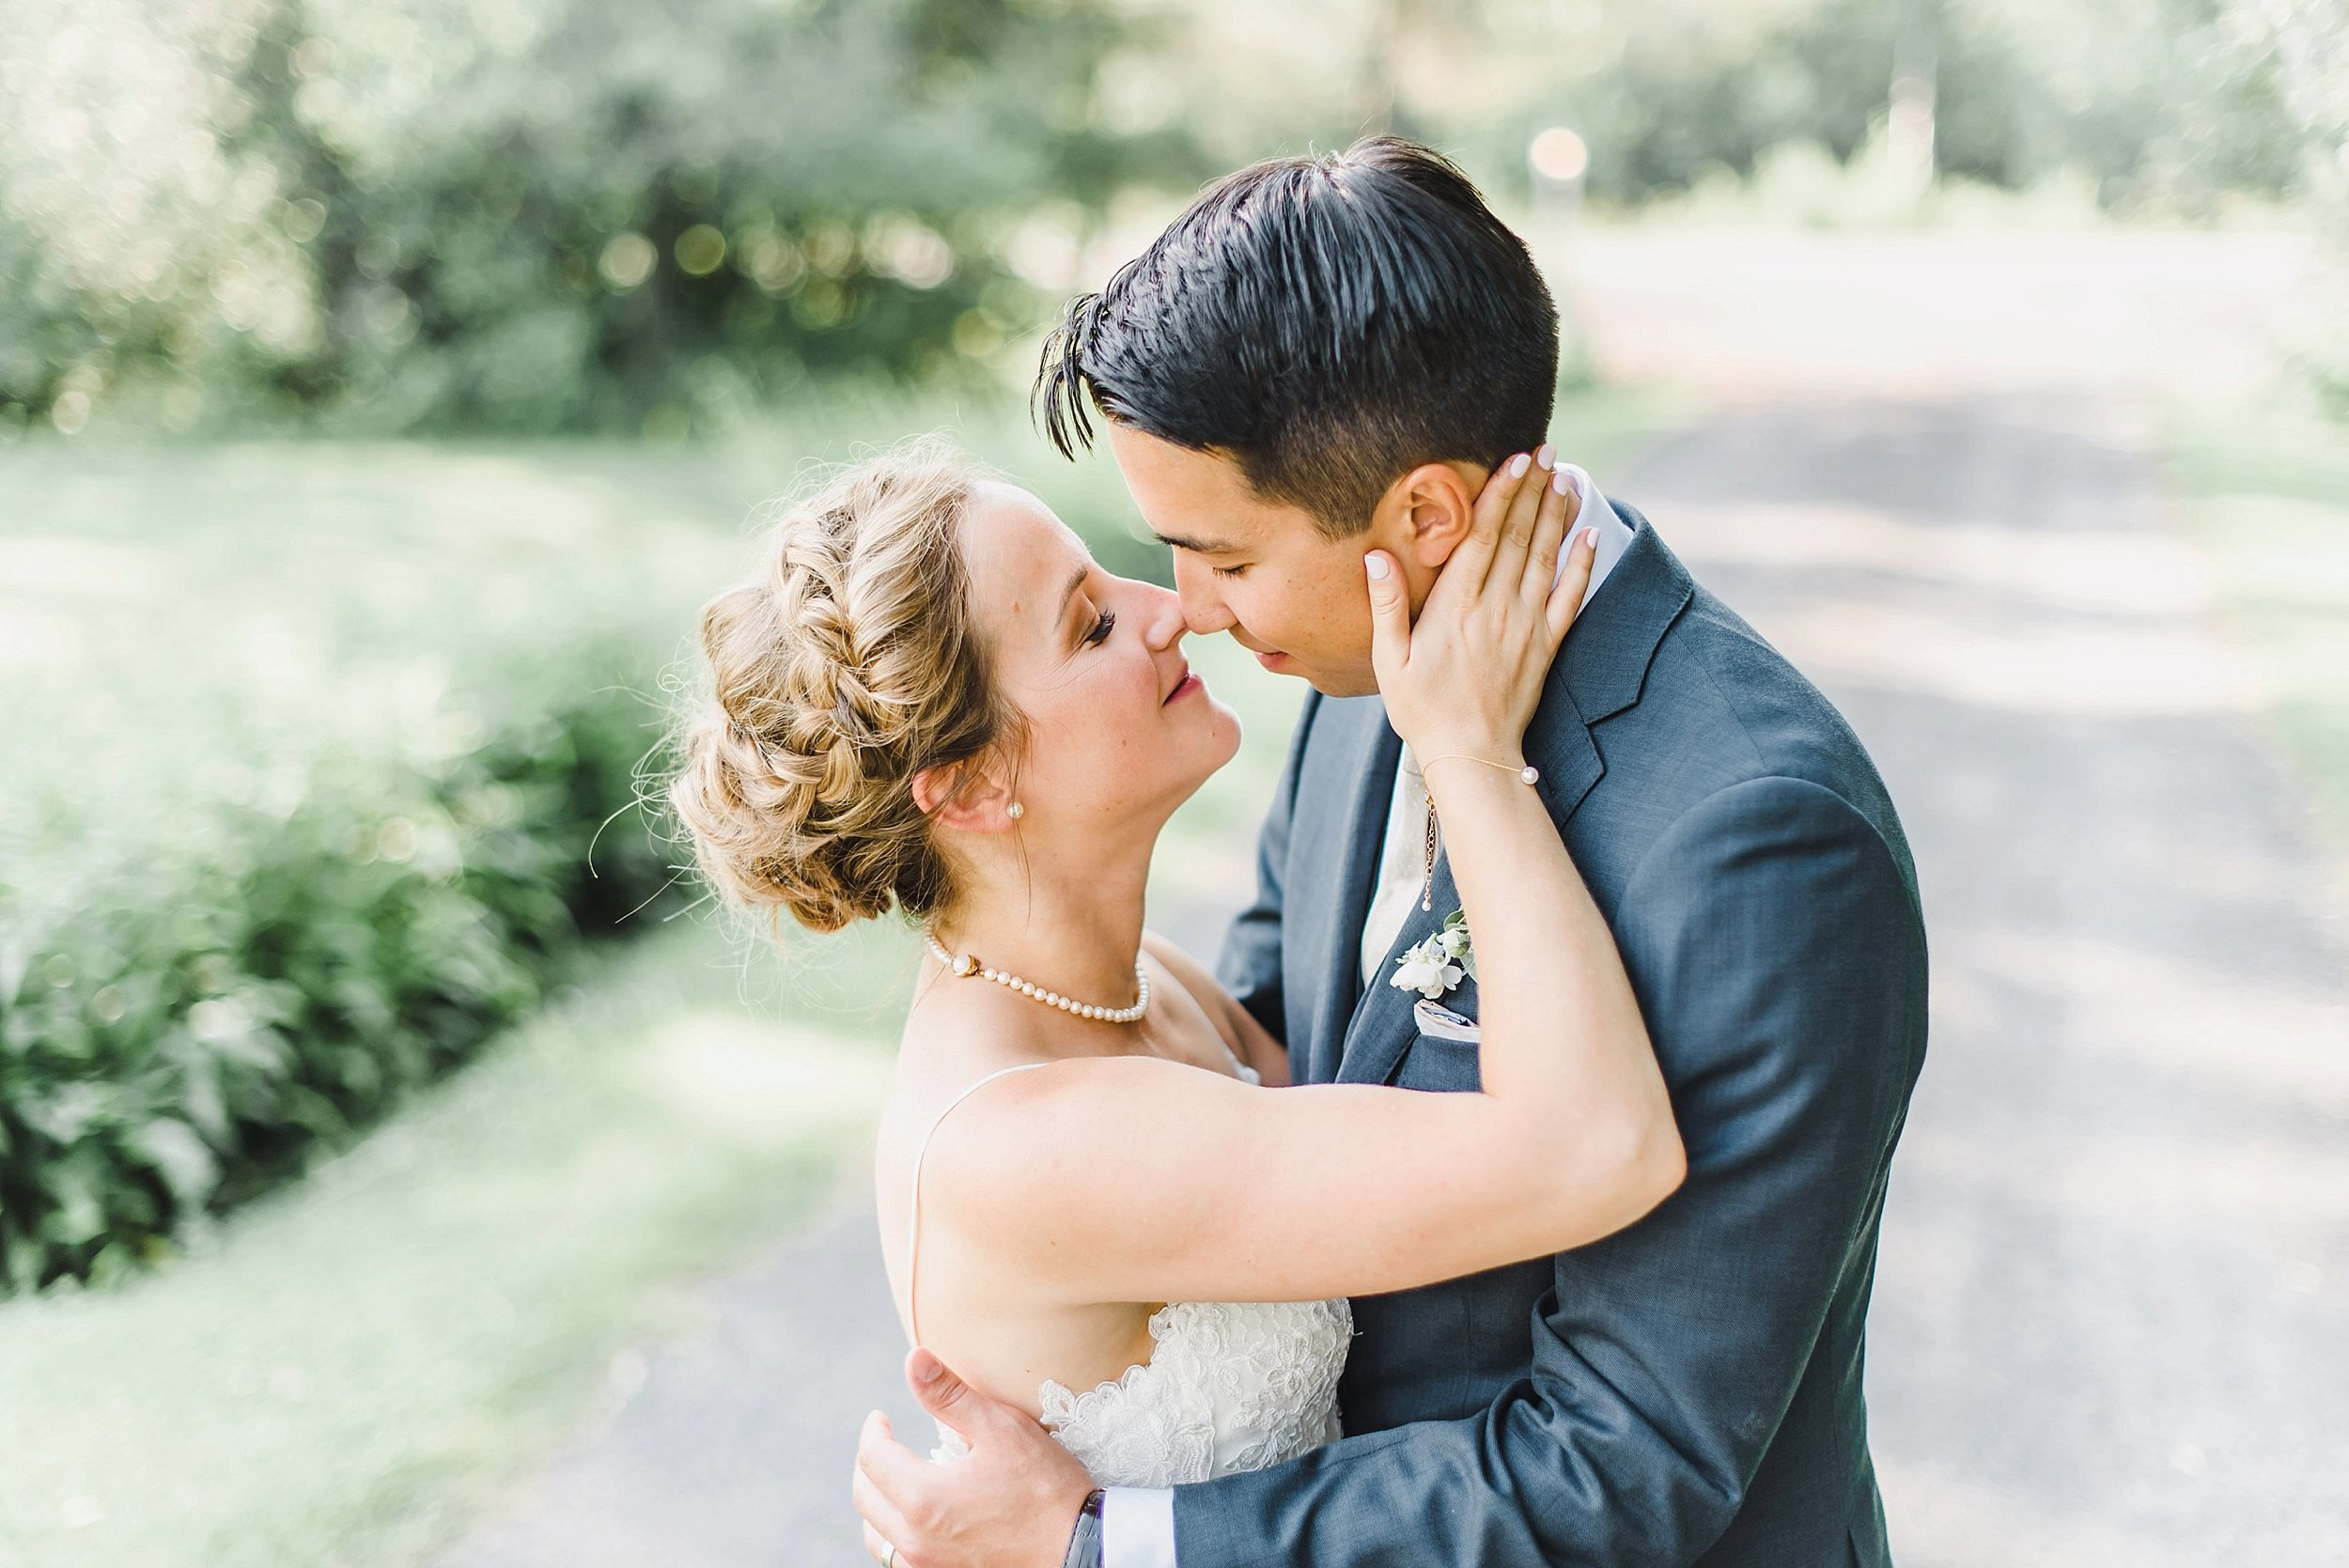 light airy indie fine art ottawa wedding photographer | Ali and Batoul Photography_0858.jpg